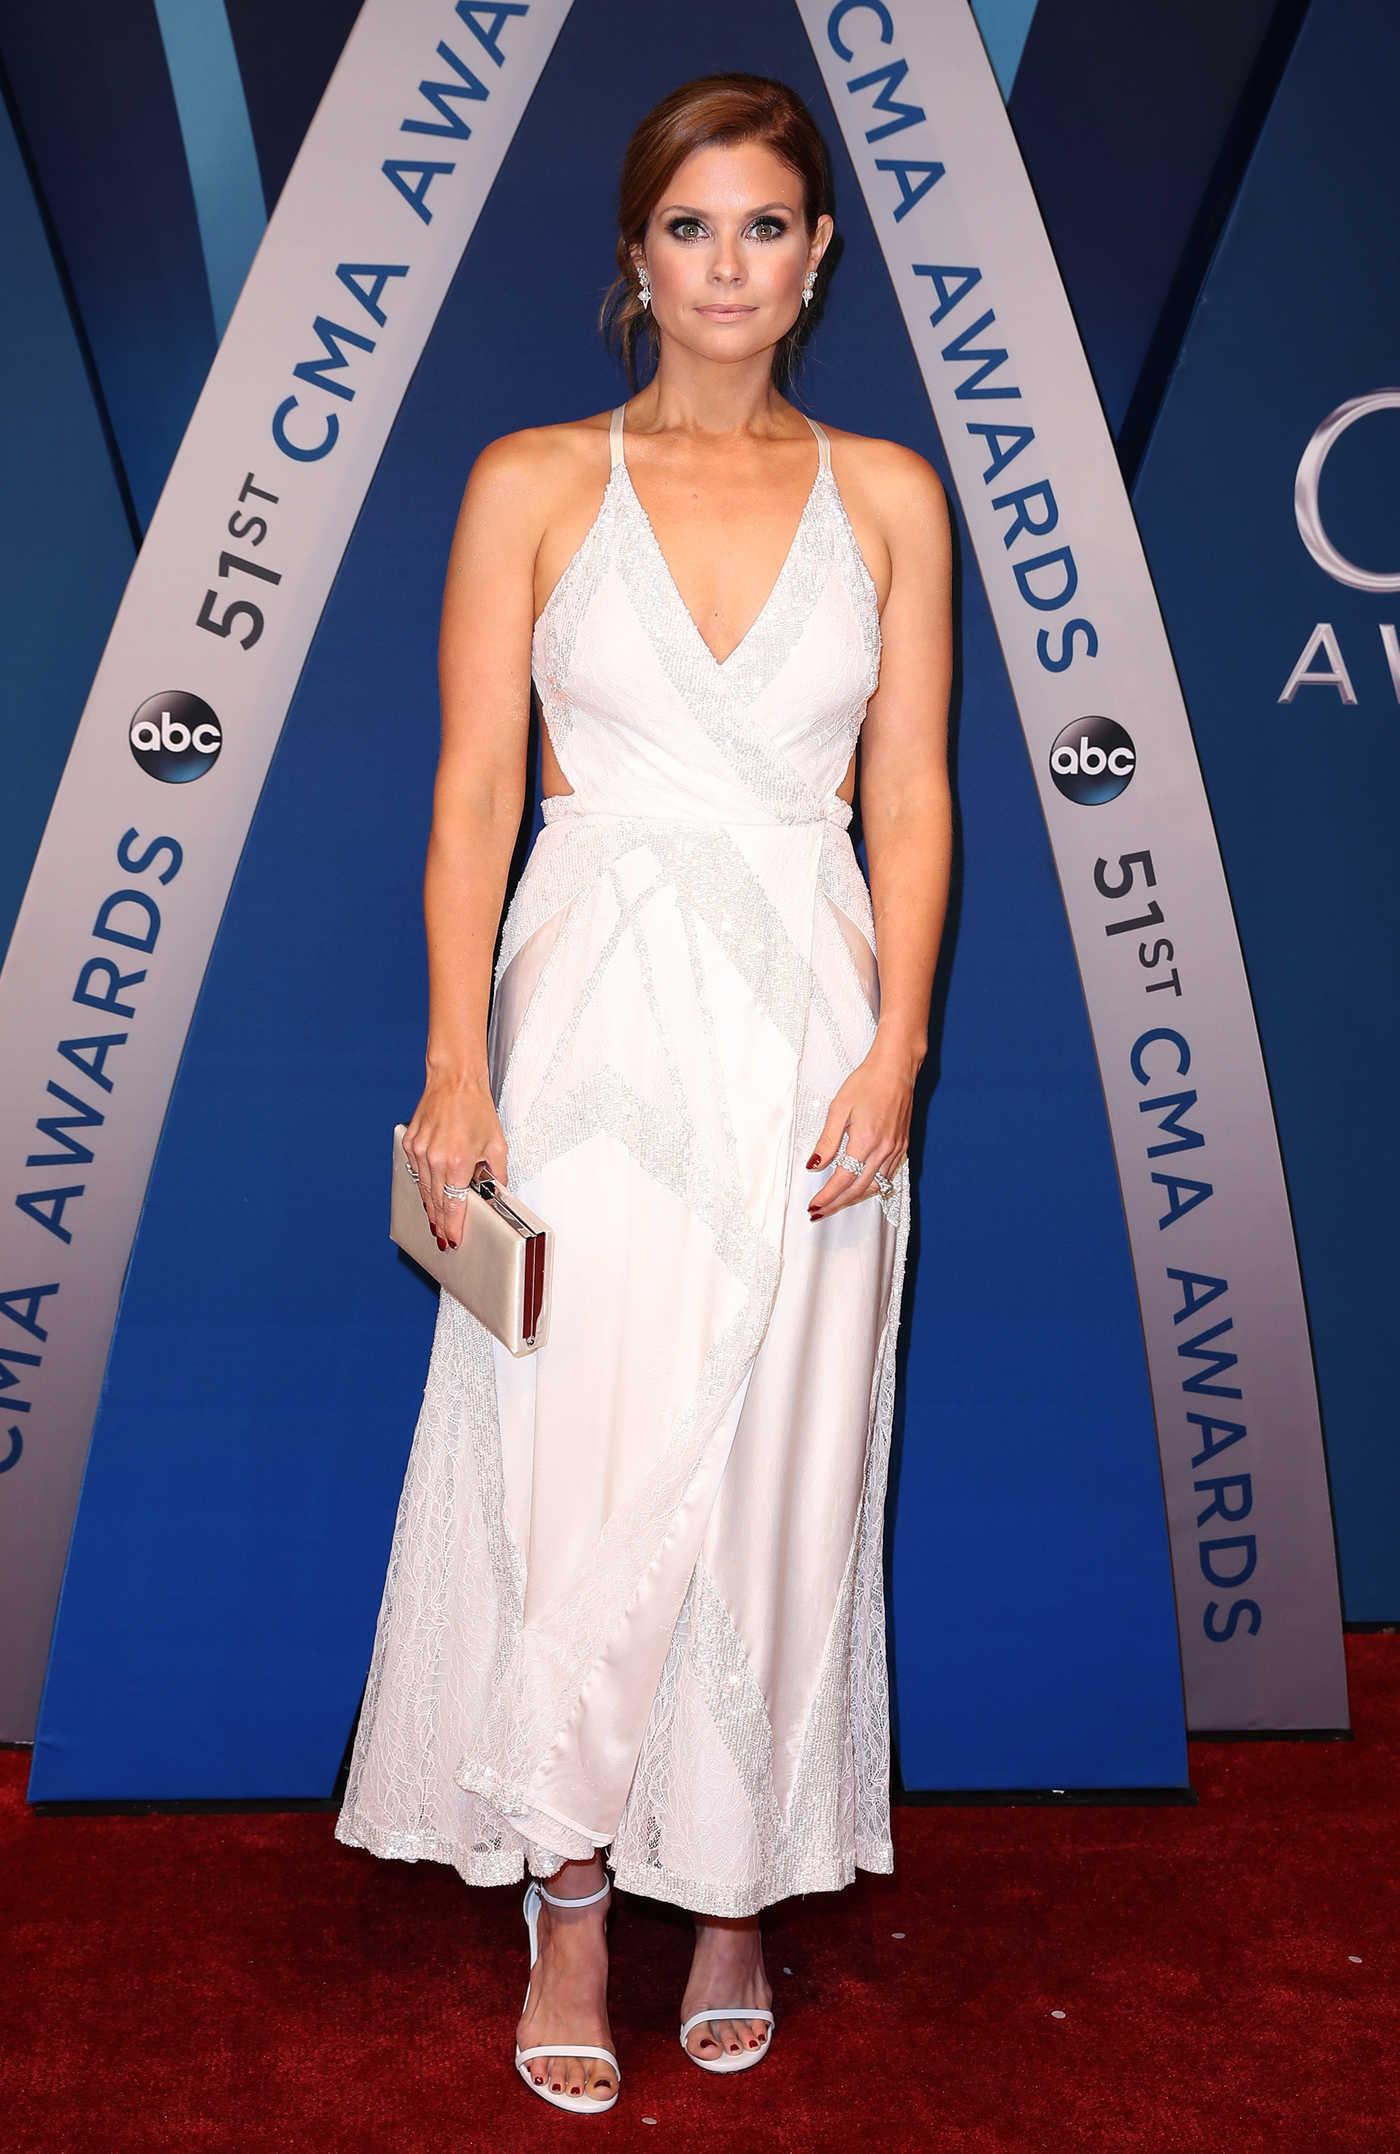 Joanna Garcia at the 51st Annual CMA Awards at the Bridgestone Arena in Nashville 11/08/2017